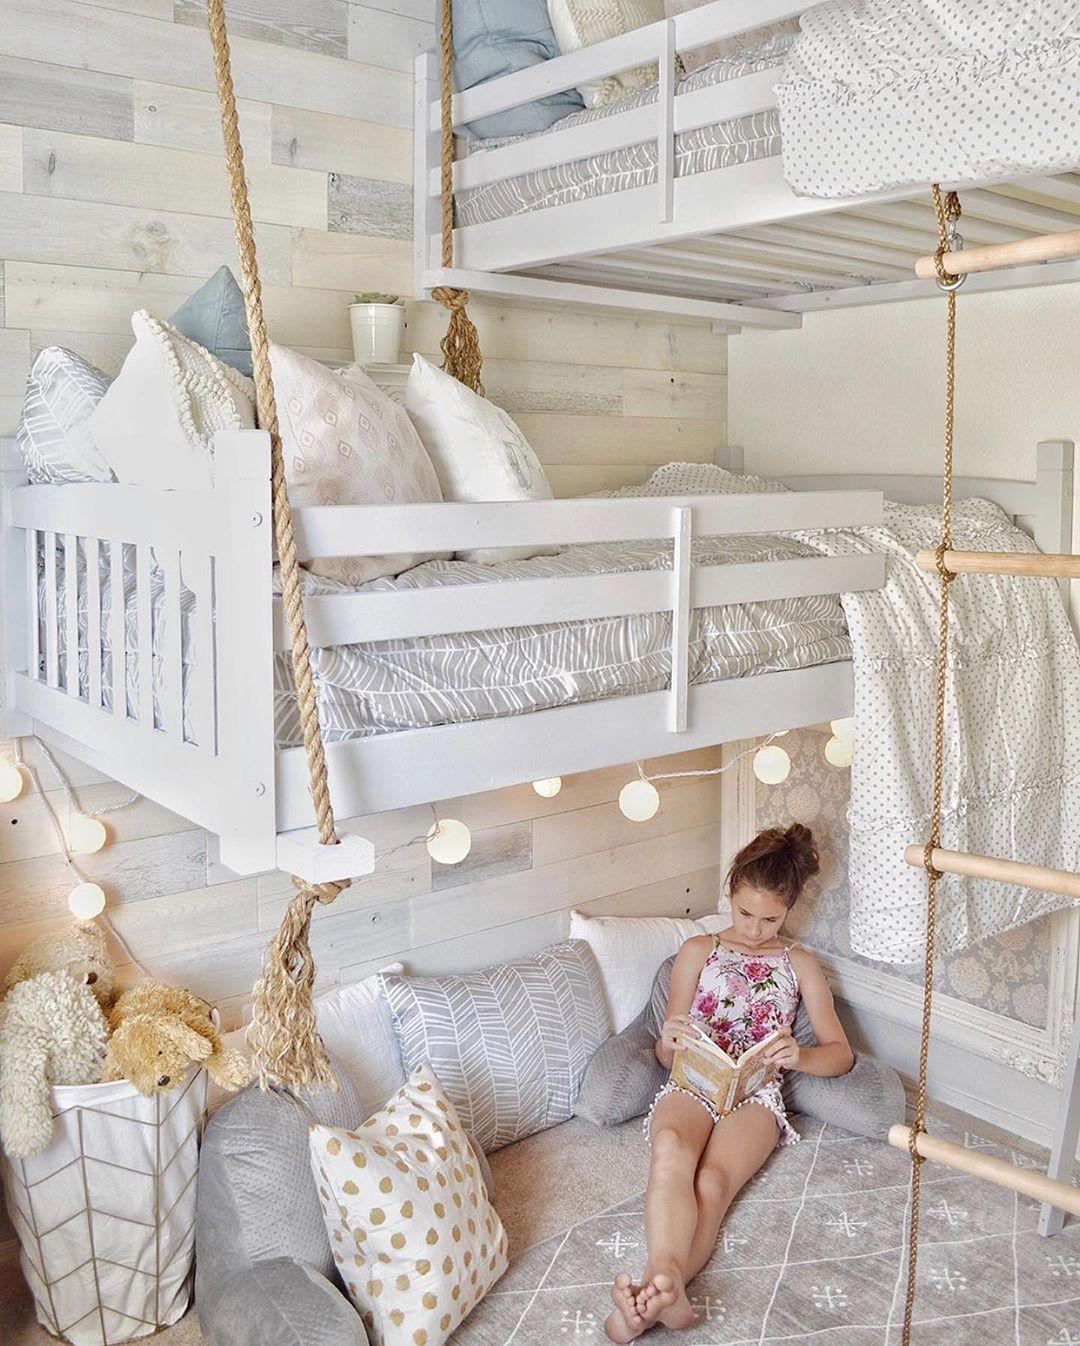 Fascinating 24 Home Decor Ideas For Small Apartments Tween Girl Bedroom Girl Bedroom Decor Girl Bedroom Designs